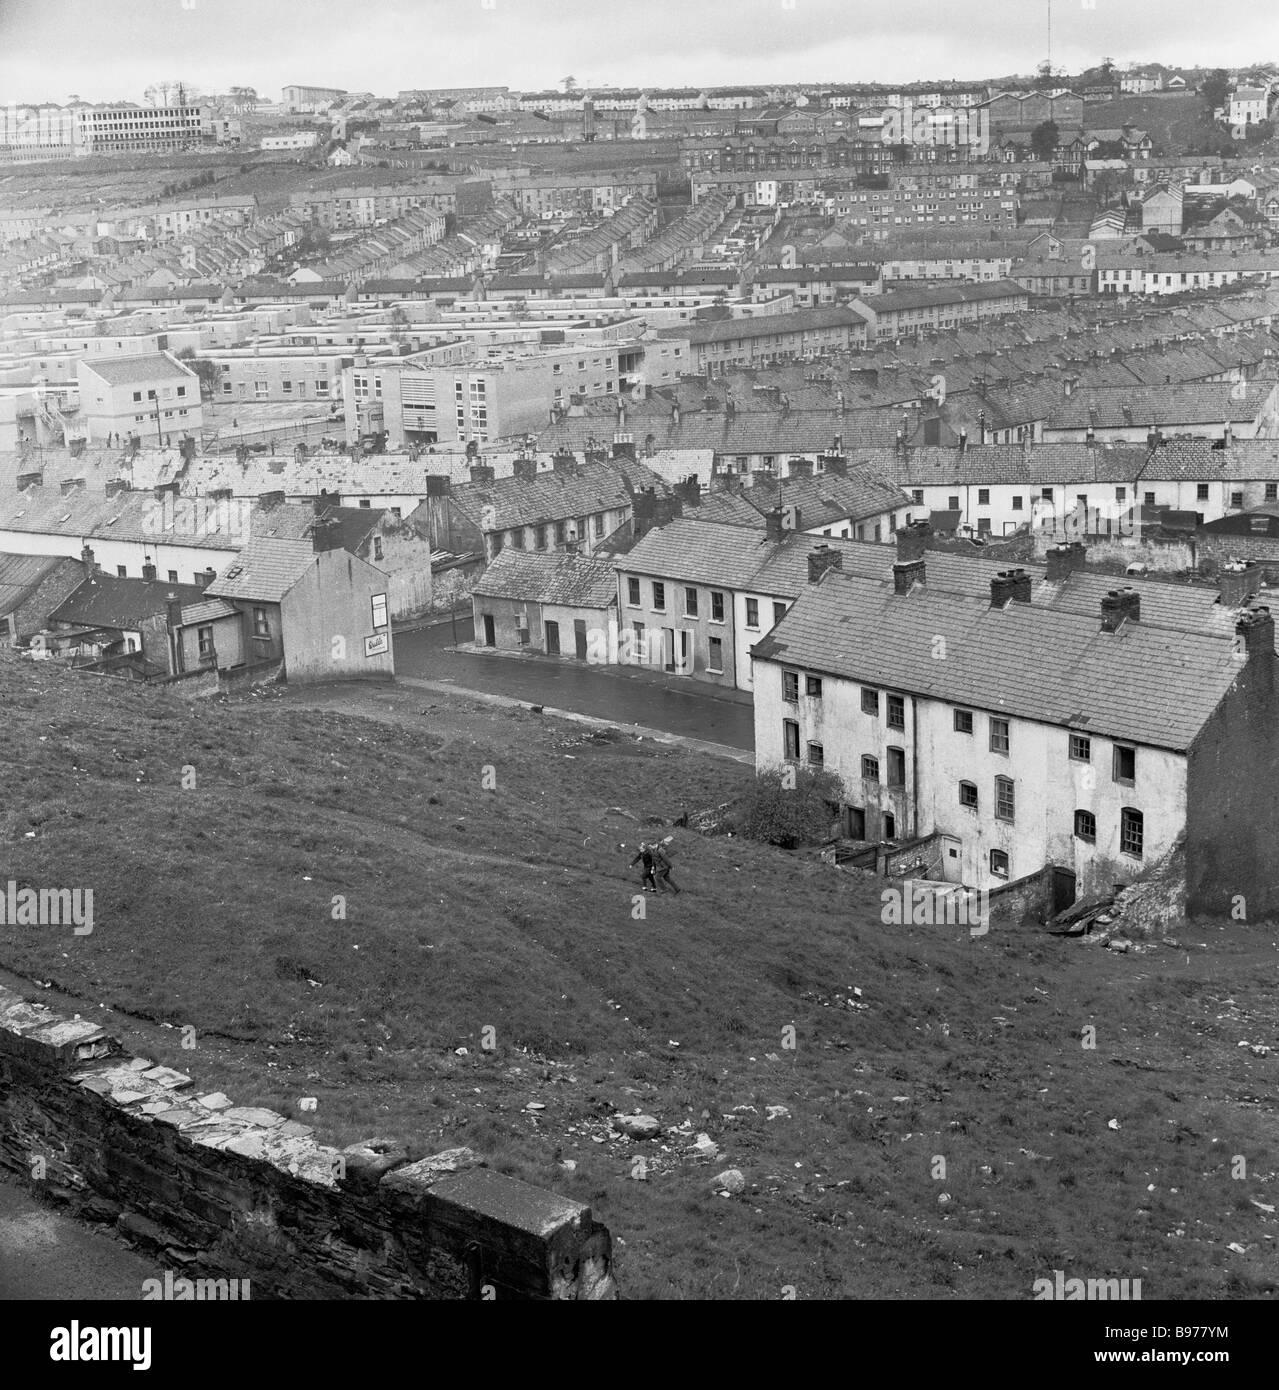 Barren urban landscape, showing a large bleak housing estate, Northern Ireland, 1960s - Stock Image